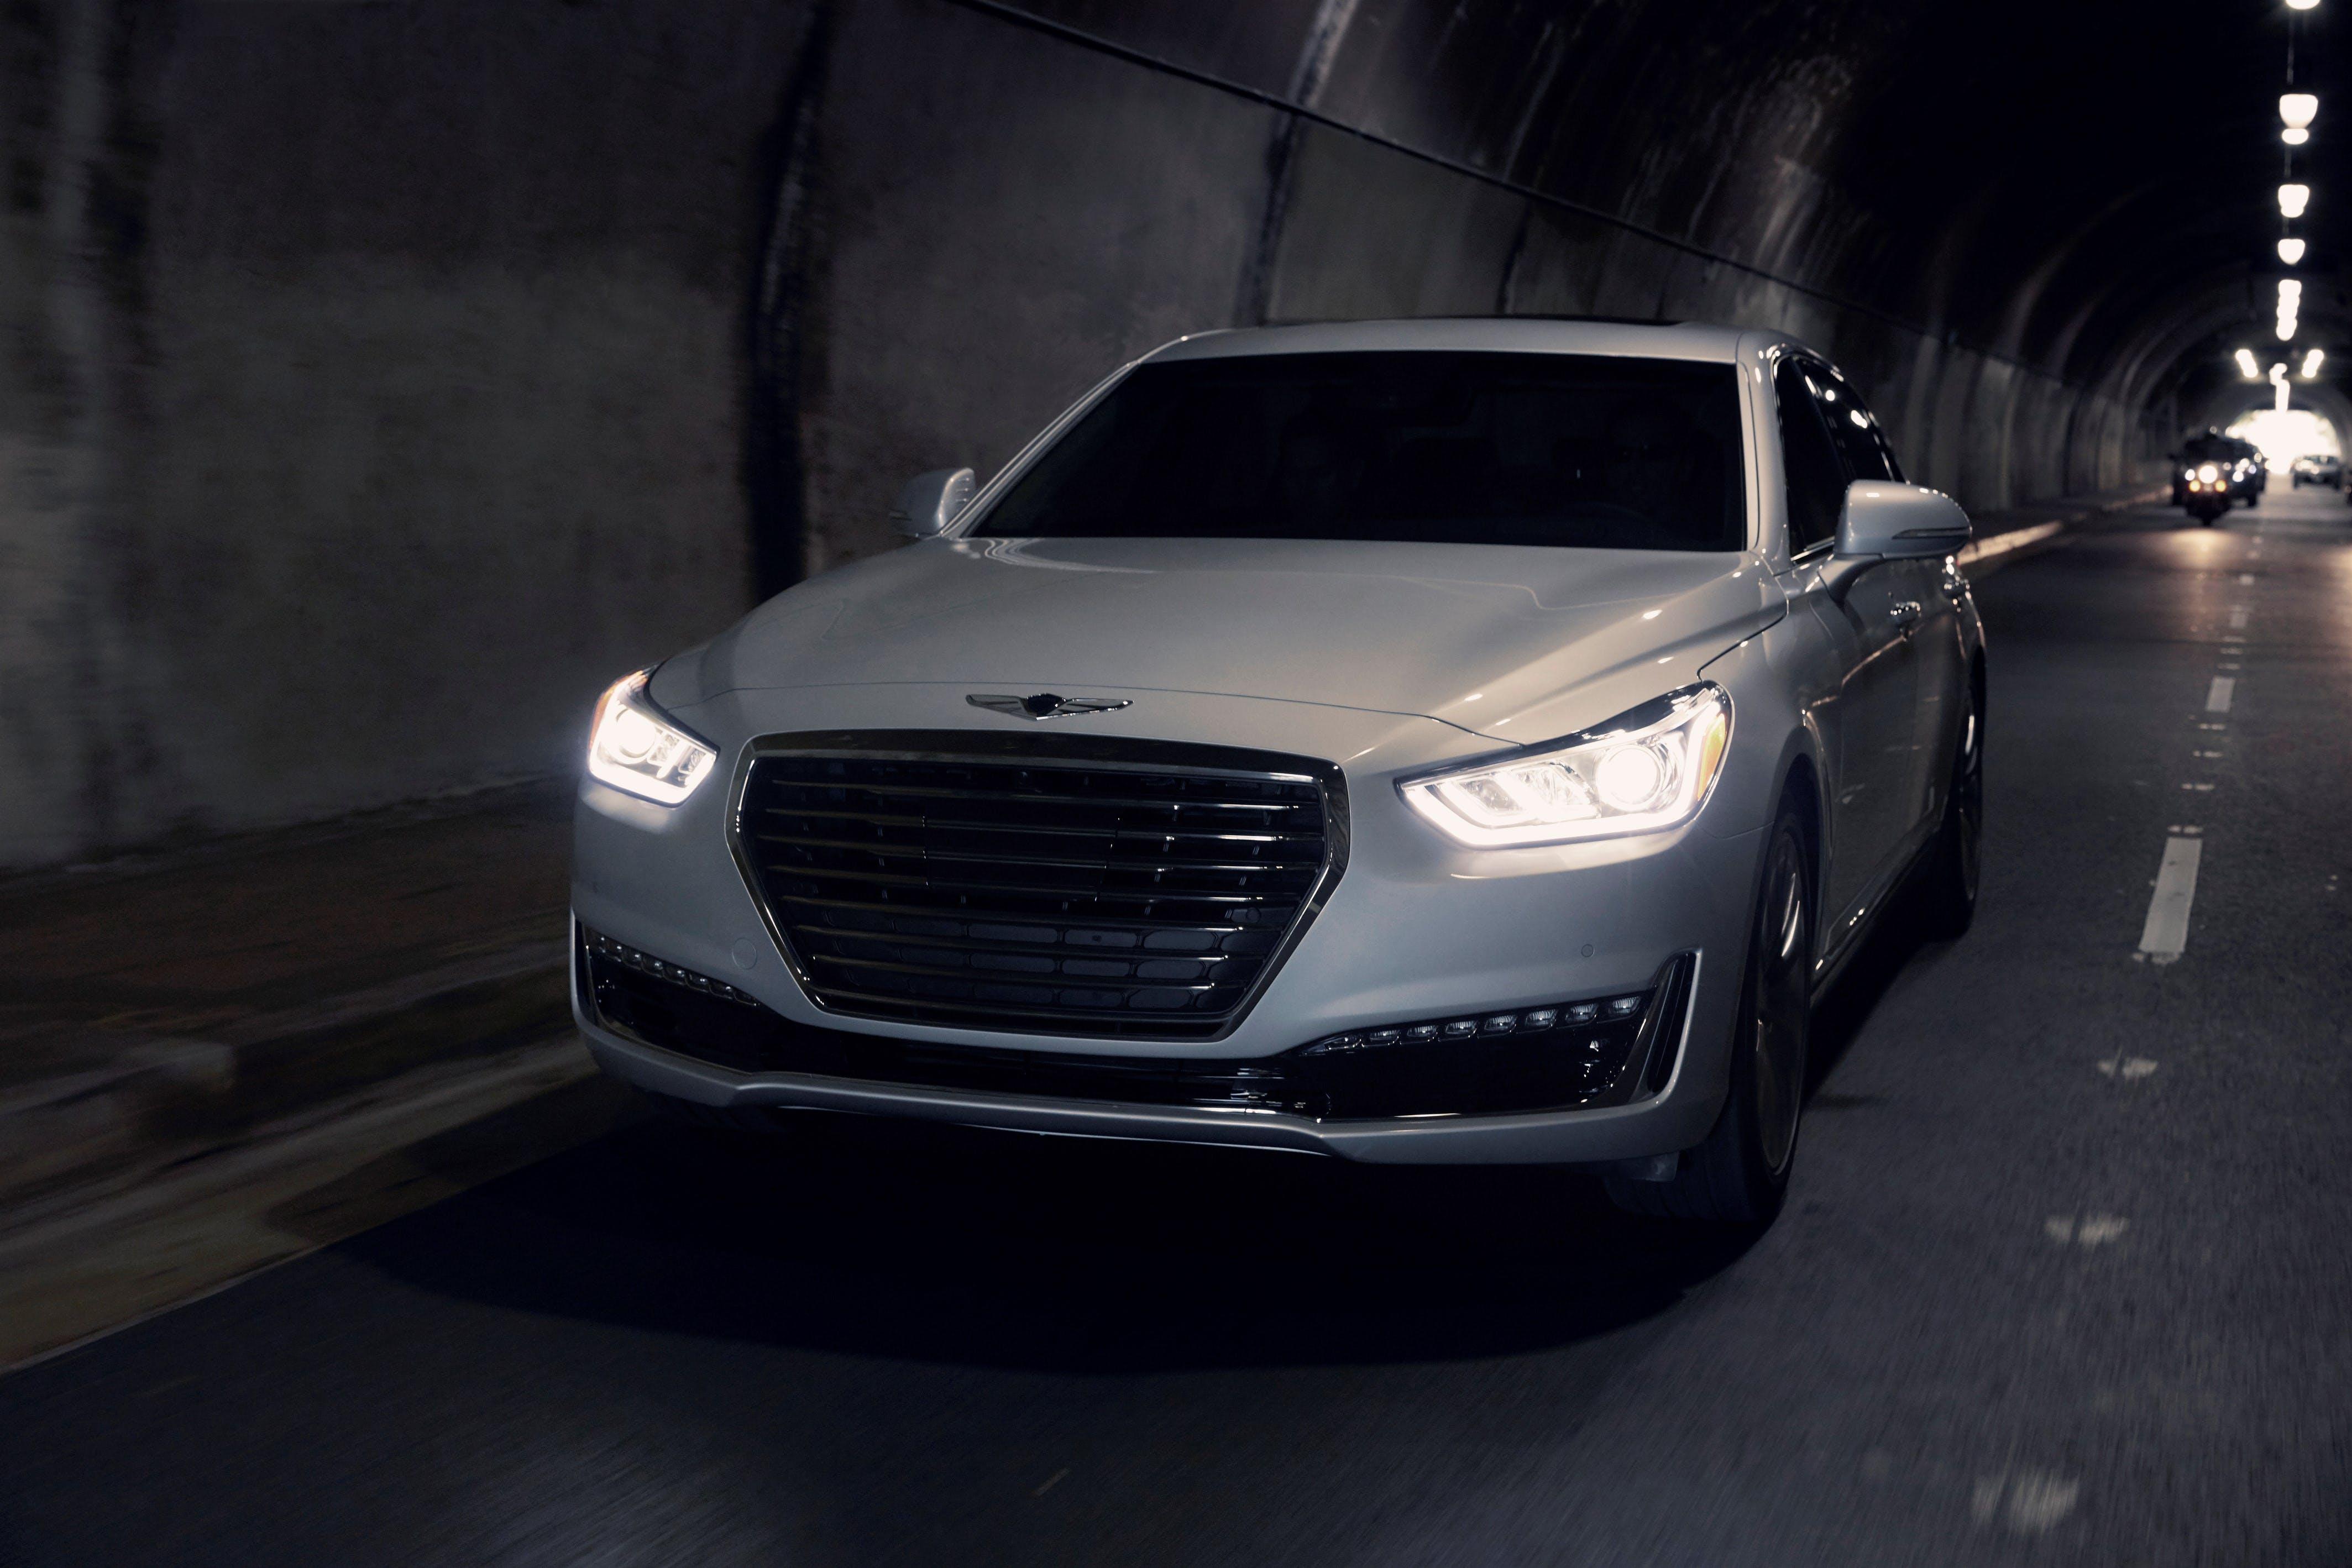 Are Led Headlights Better Than Halogen Headlights Carfax Blog